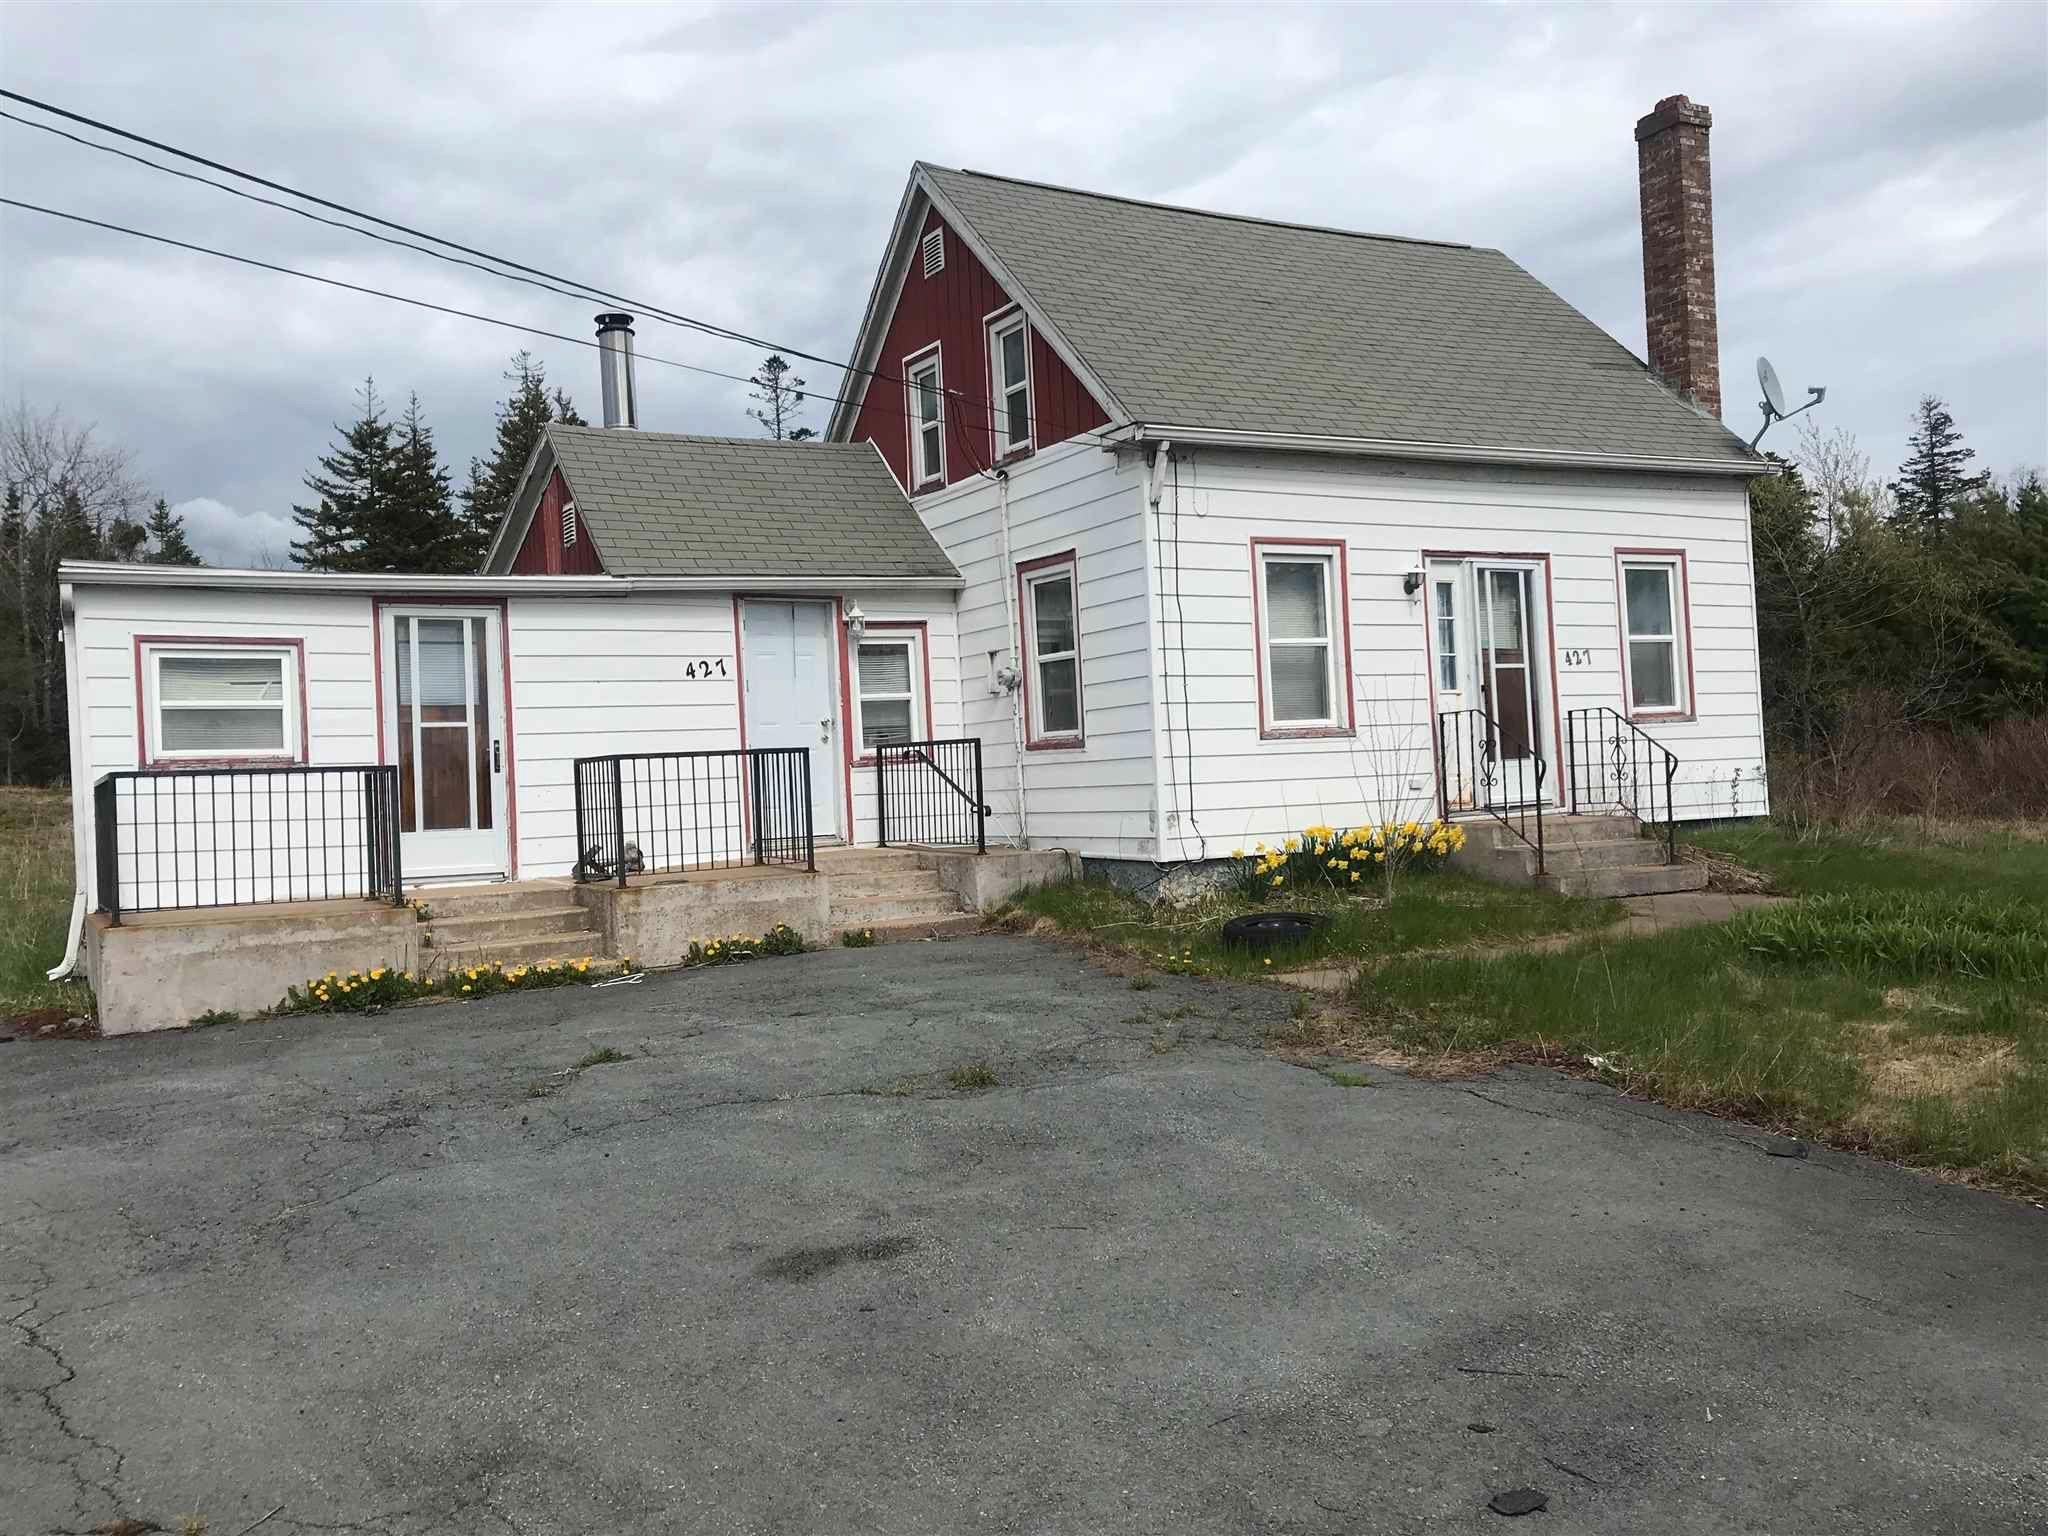 Main Photo: 427 Pockwock Road in Hammonds Plains: 21-Kingswood, Haliburton Hills, Hammonds Pl. Residential for sale (Halifax-Dartmouth)  : MLS®# 202111850